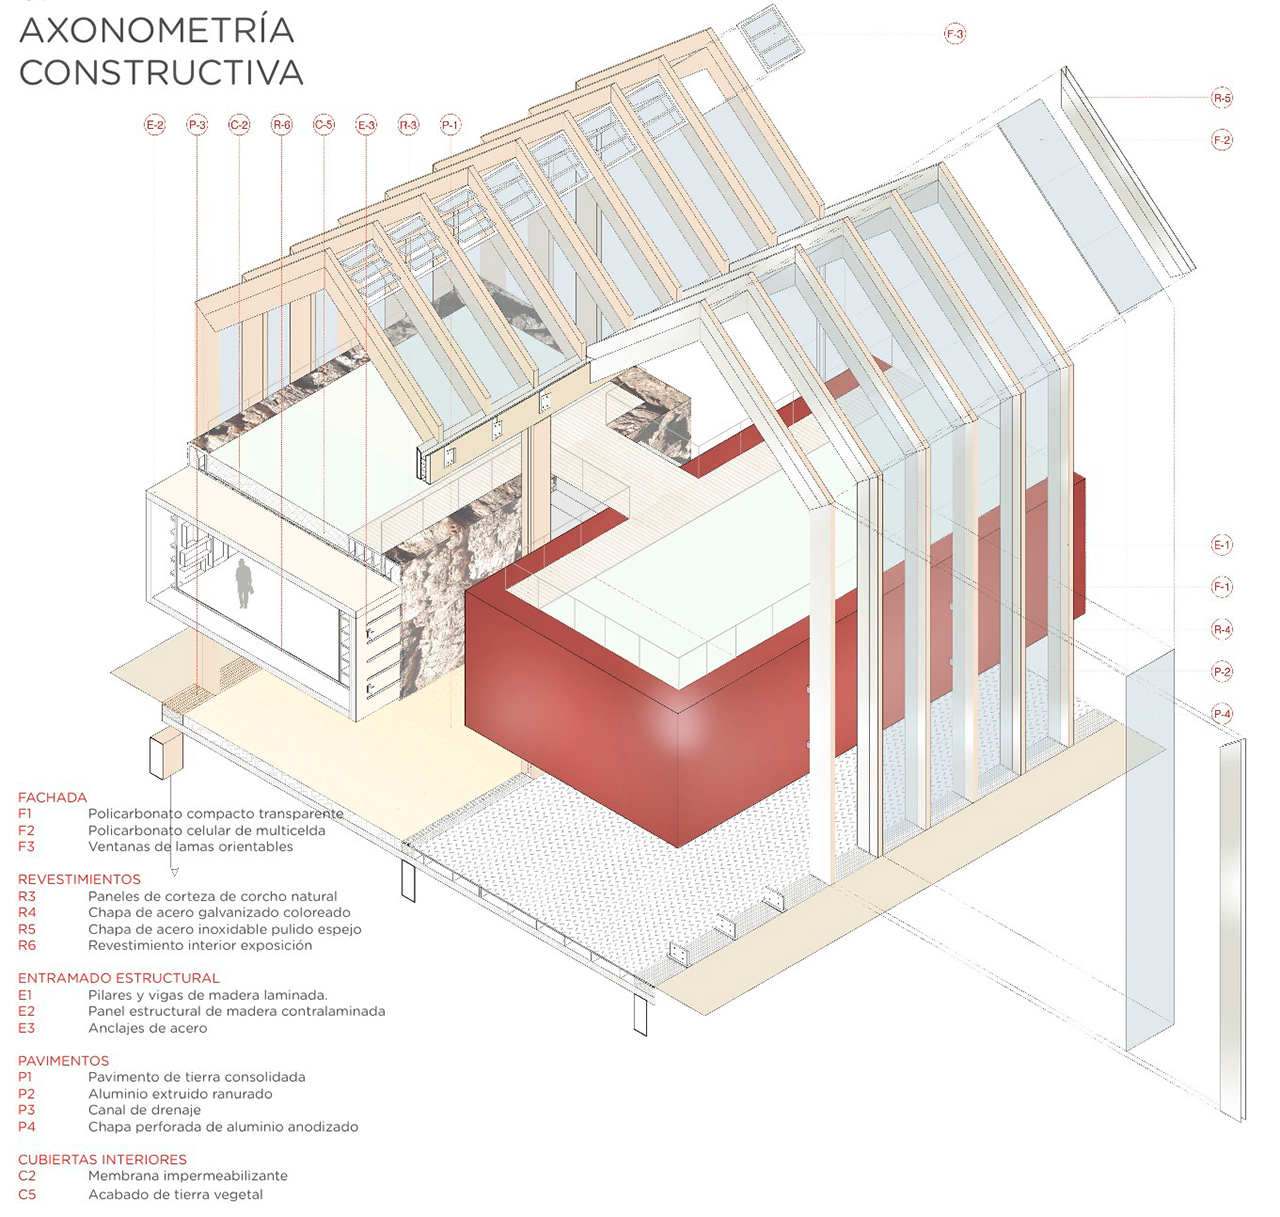 B720 dise ar el pabell n espa ol en expo milano 2015 - Eau arquitectura ...